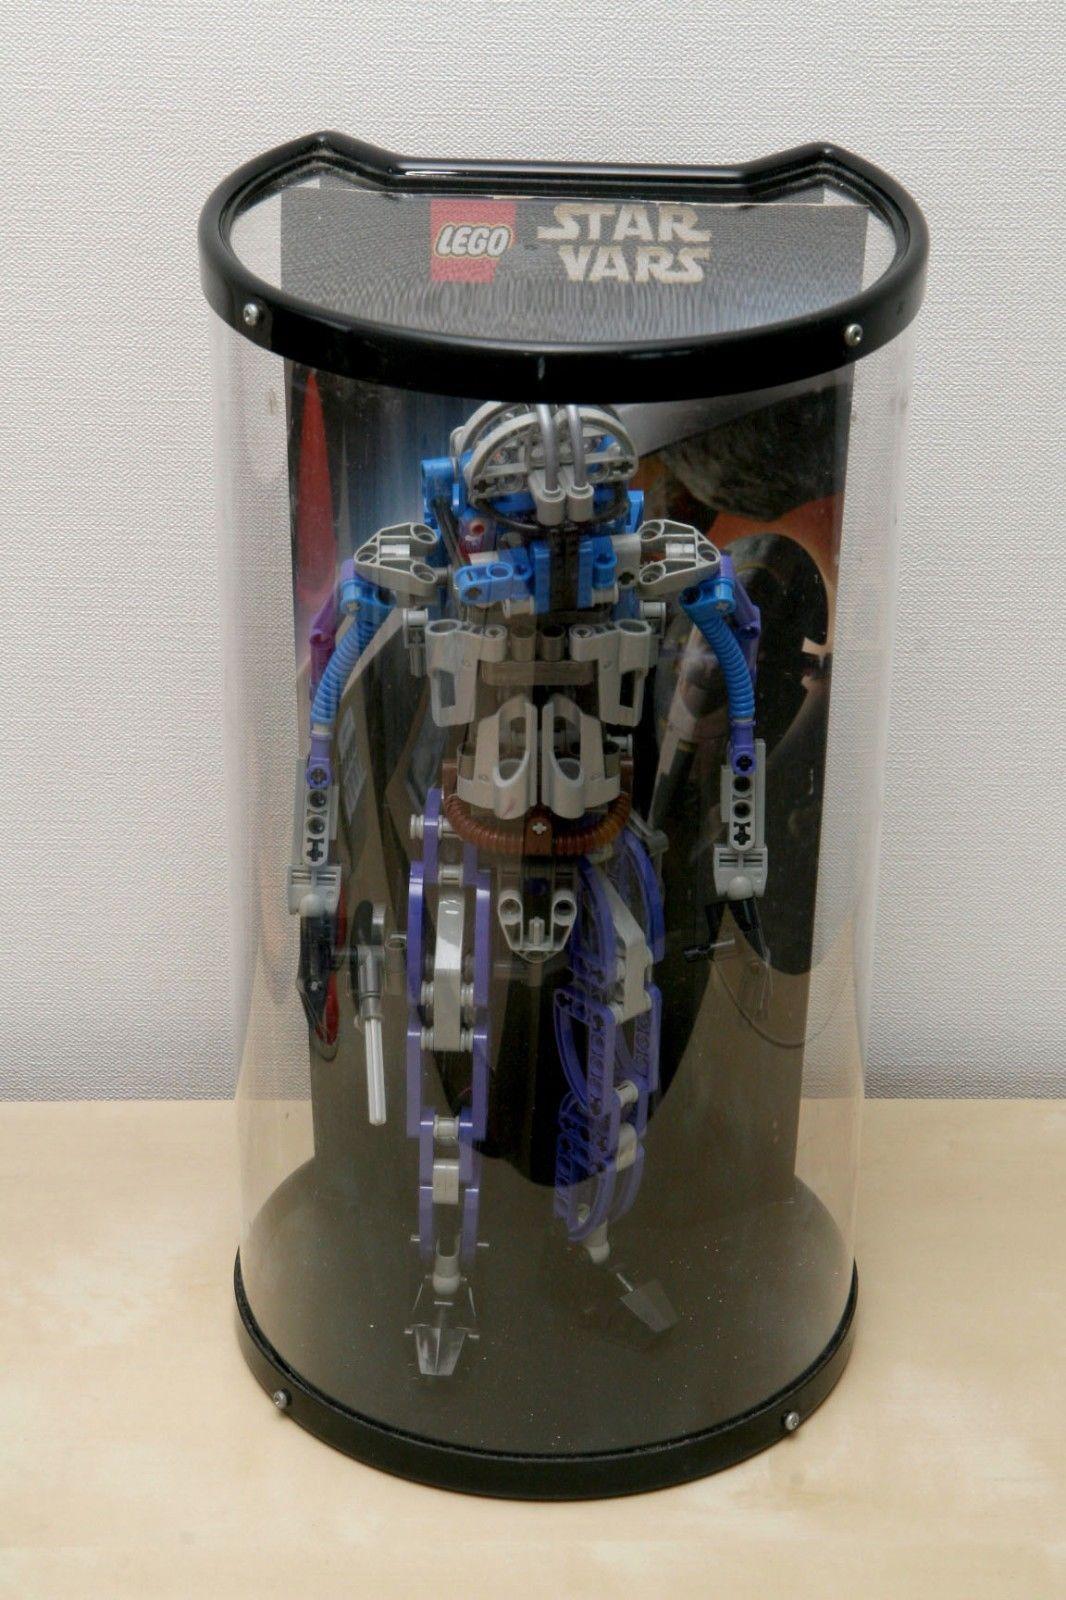 Lego Star Wars 8011 Jango Fett Retail Store Display Case front